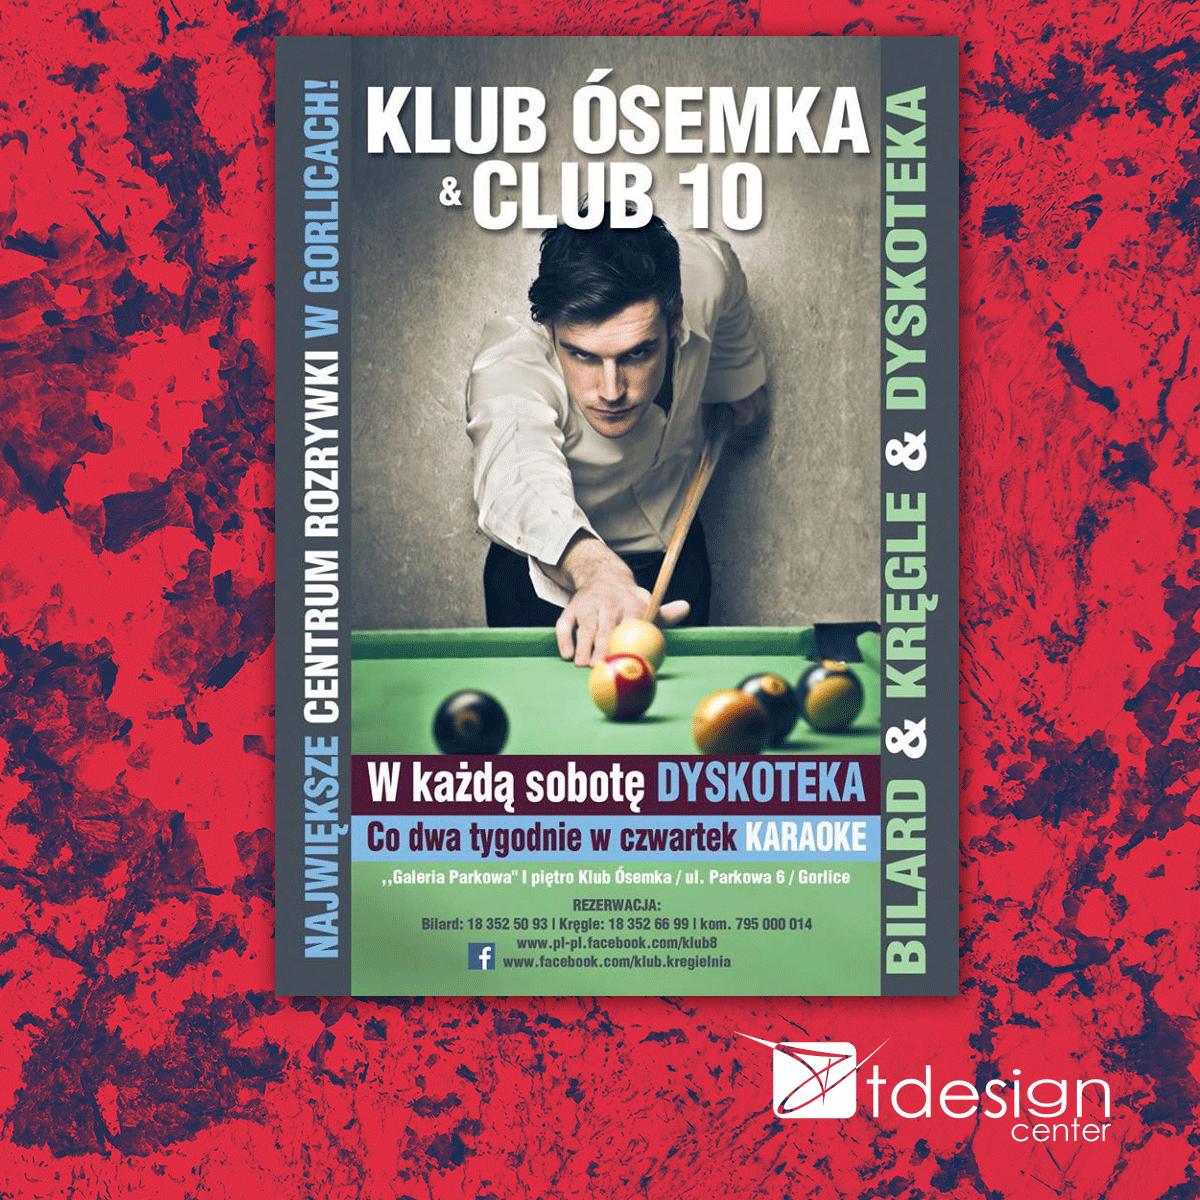 Plakat, projekt wykonany dla klubu Ósemka